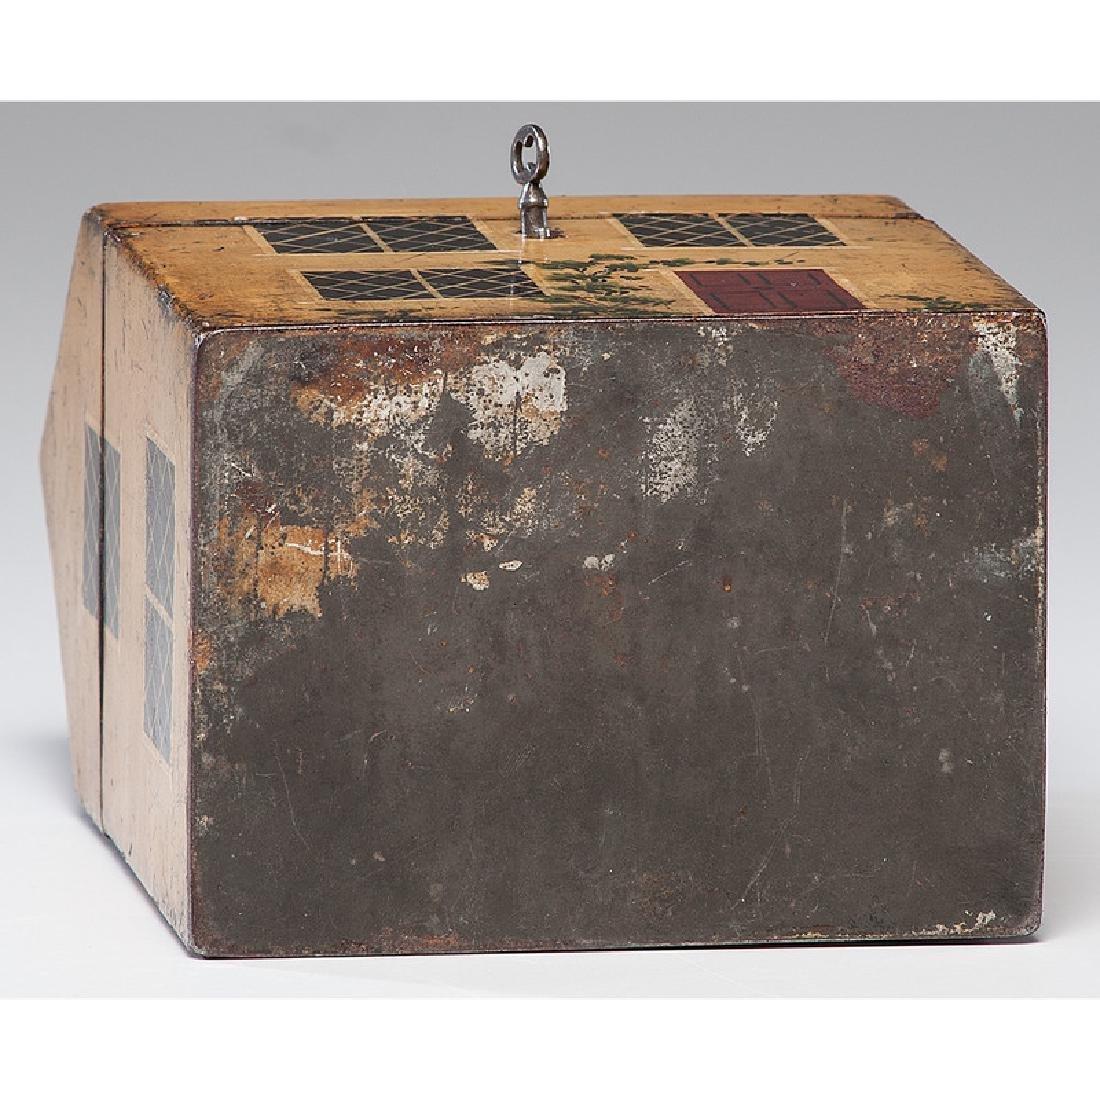 Rare Toleware Cottage Form Tea Caddy - 7